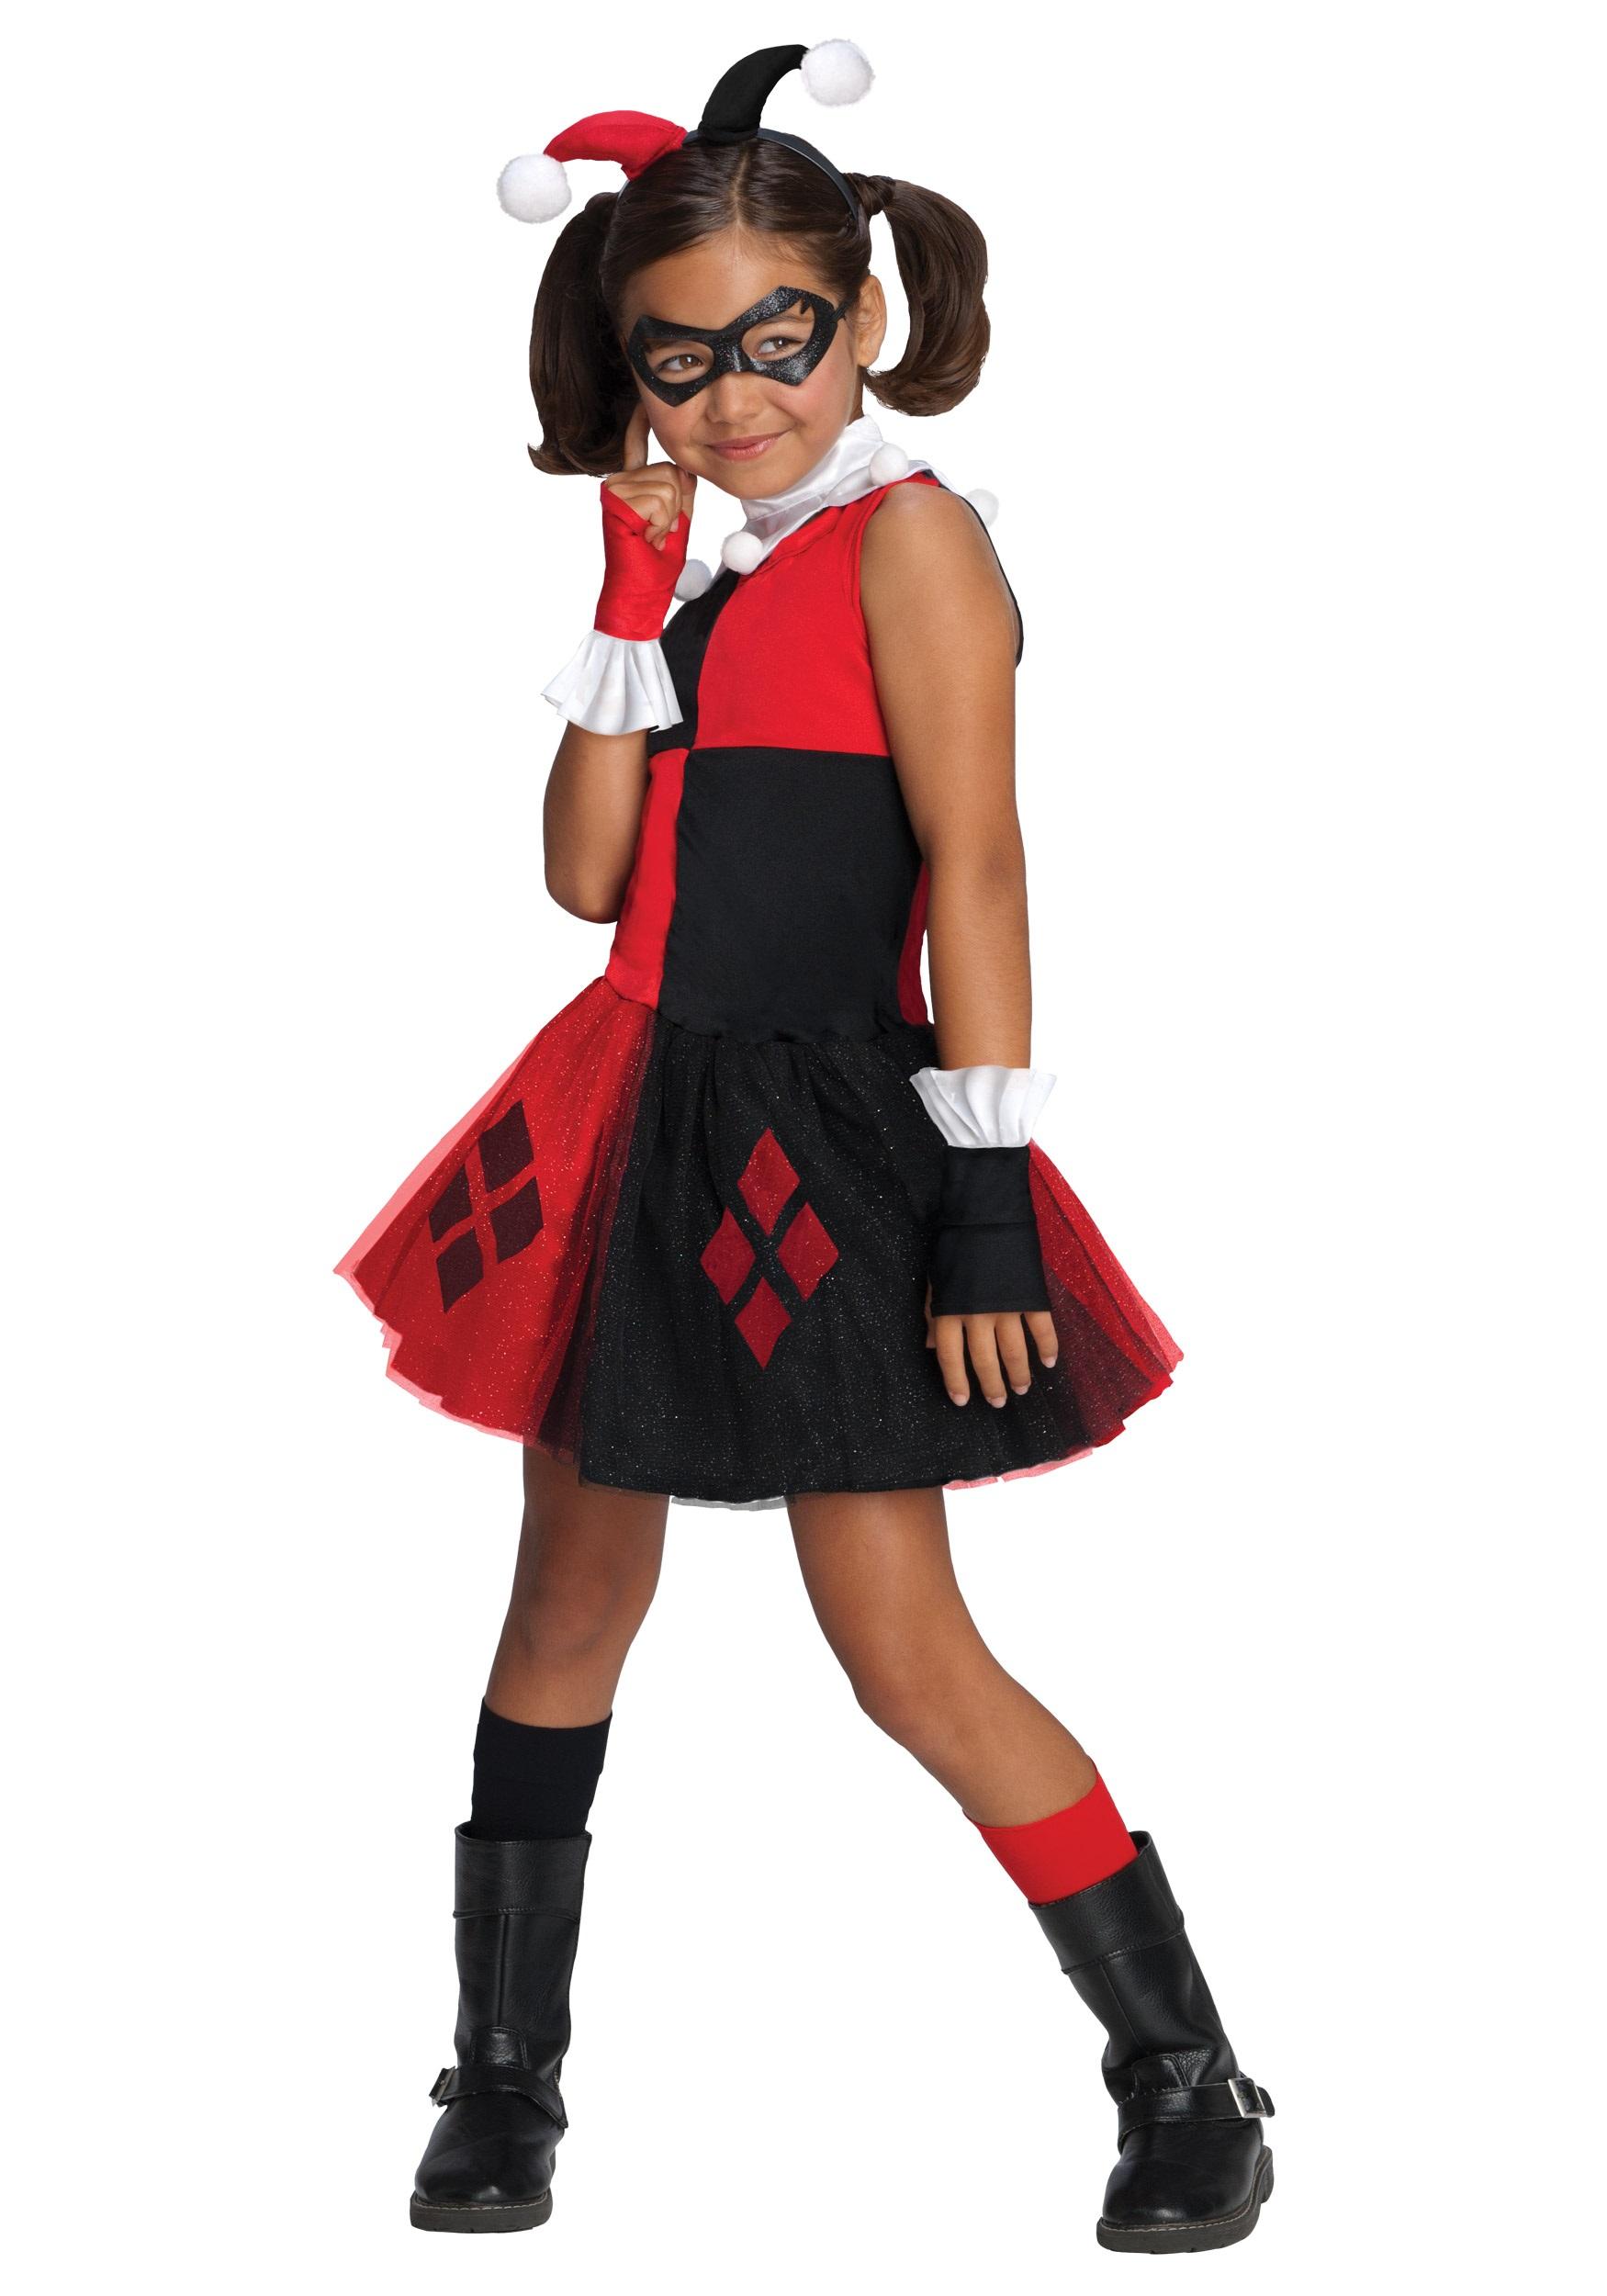 47a58062c3b Girls Harley Quinn Tutu Costume